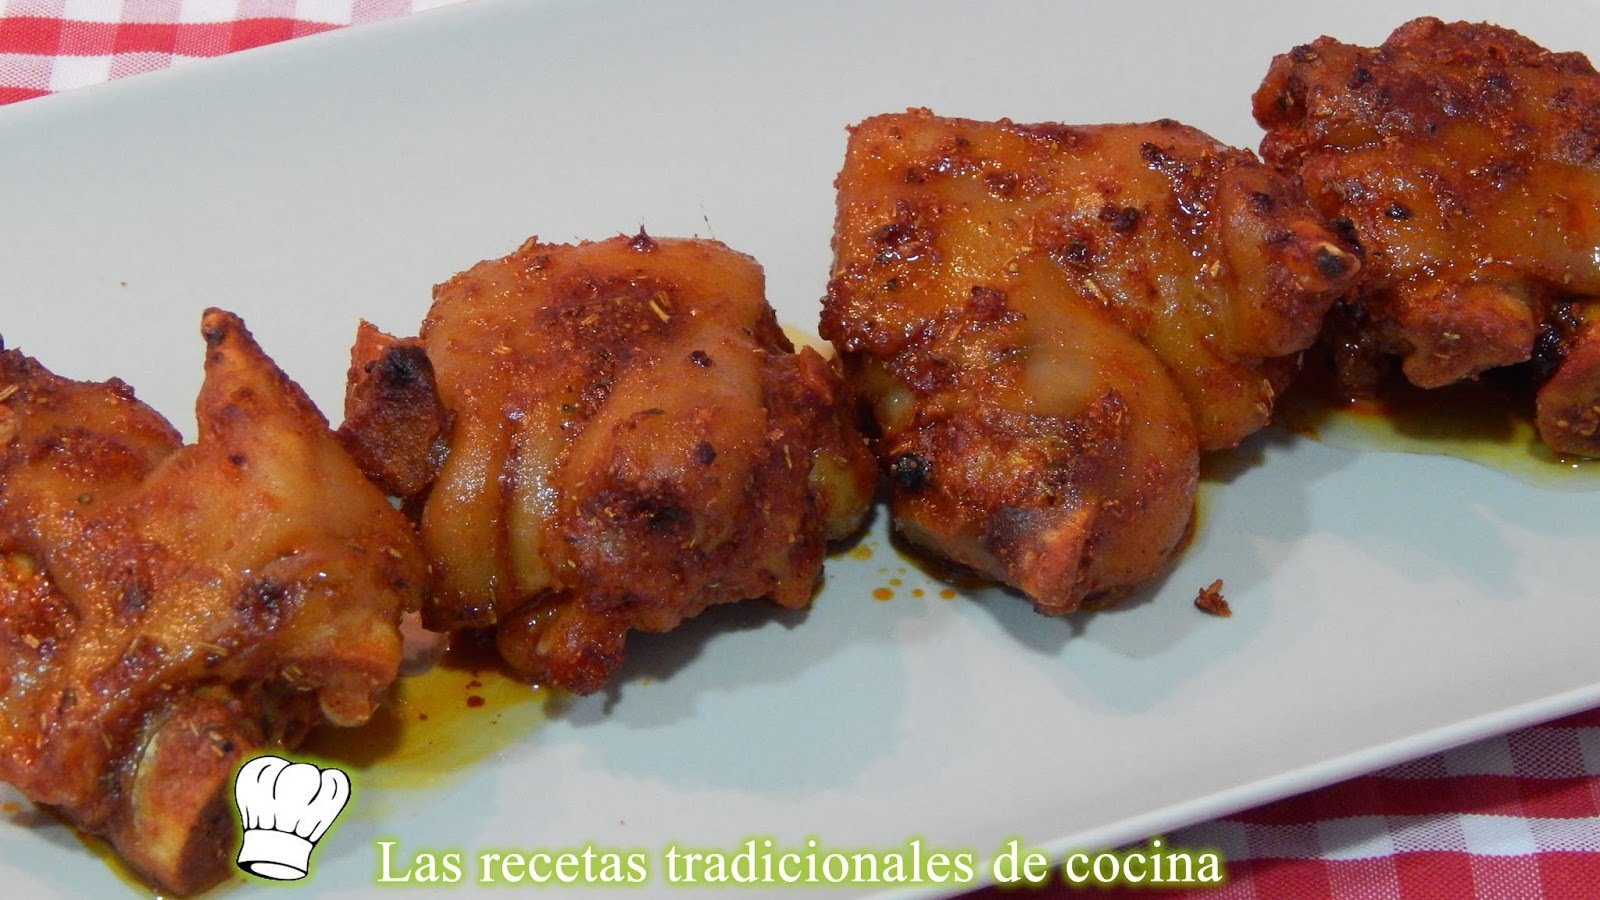 Manitas de cerdo adobadas al horno receta fácil